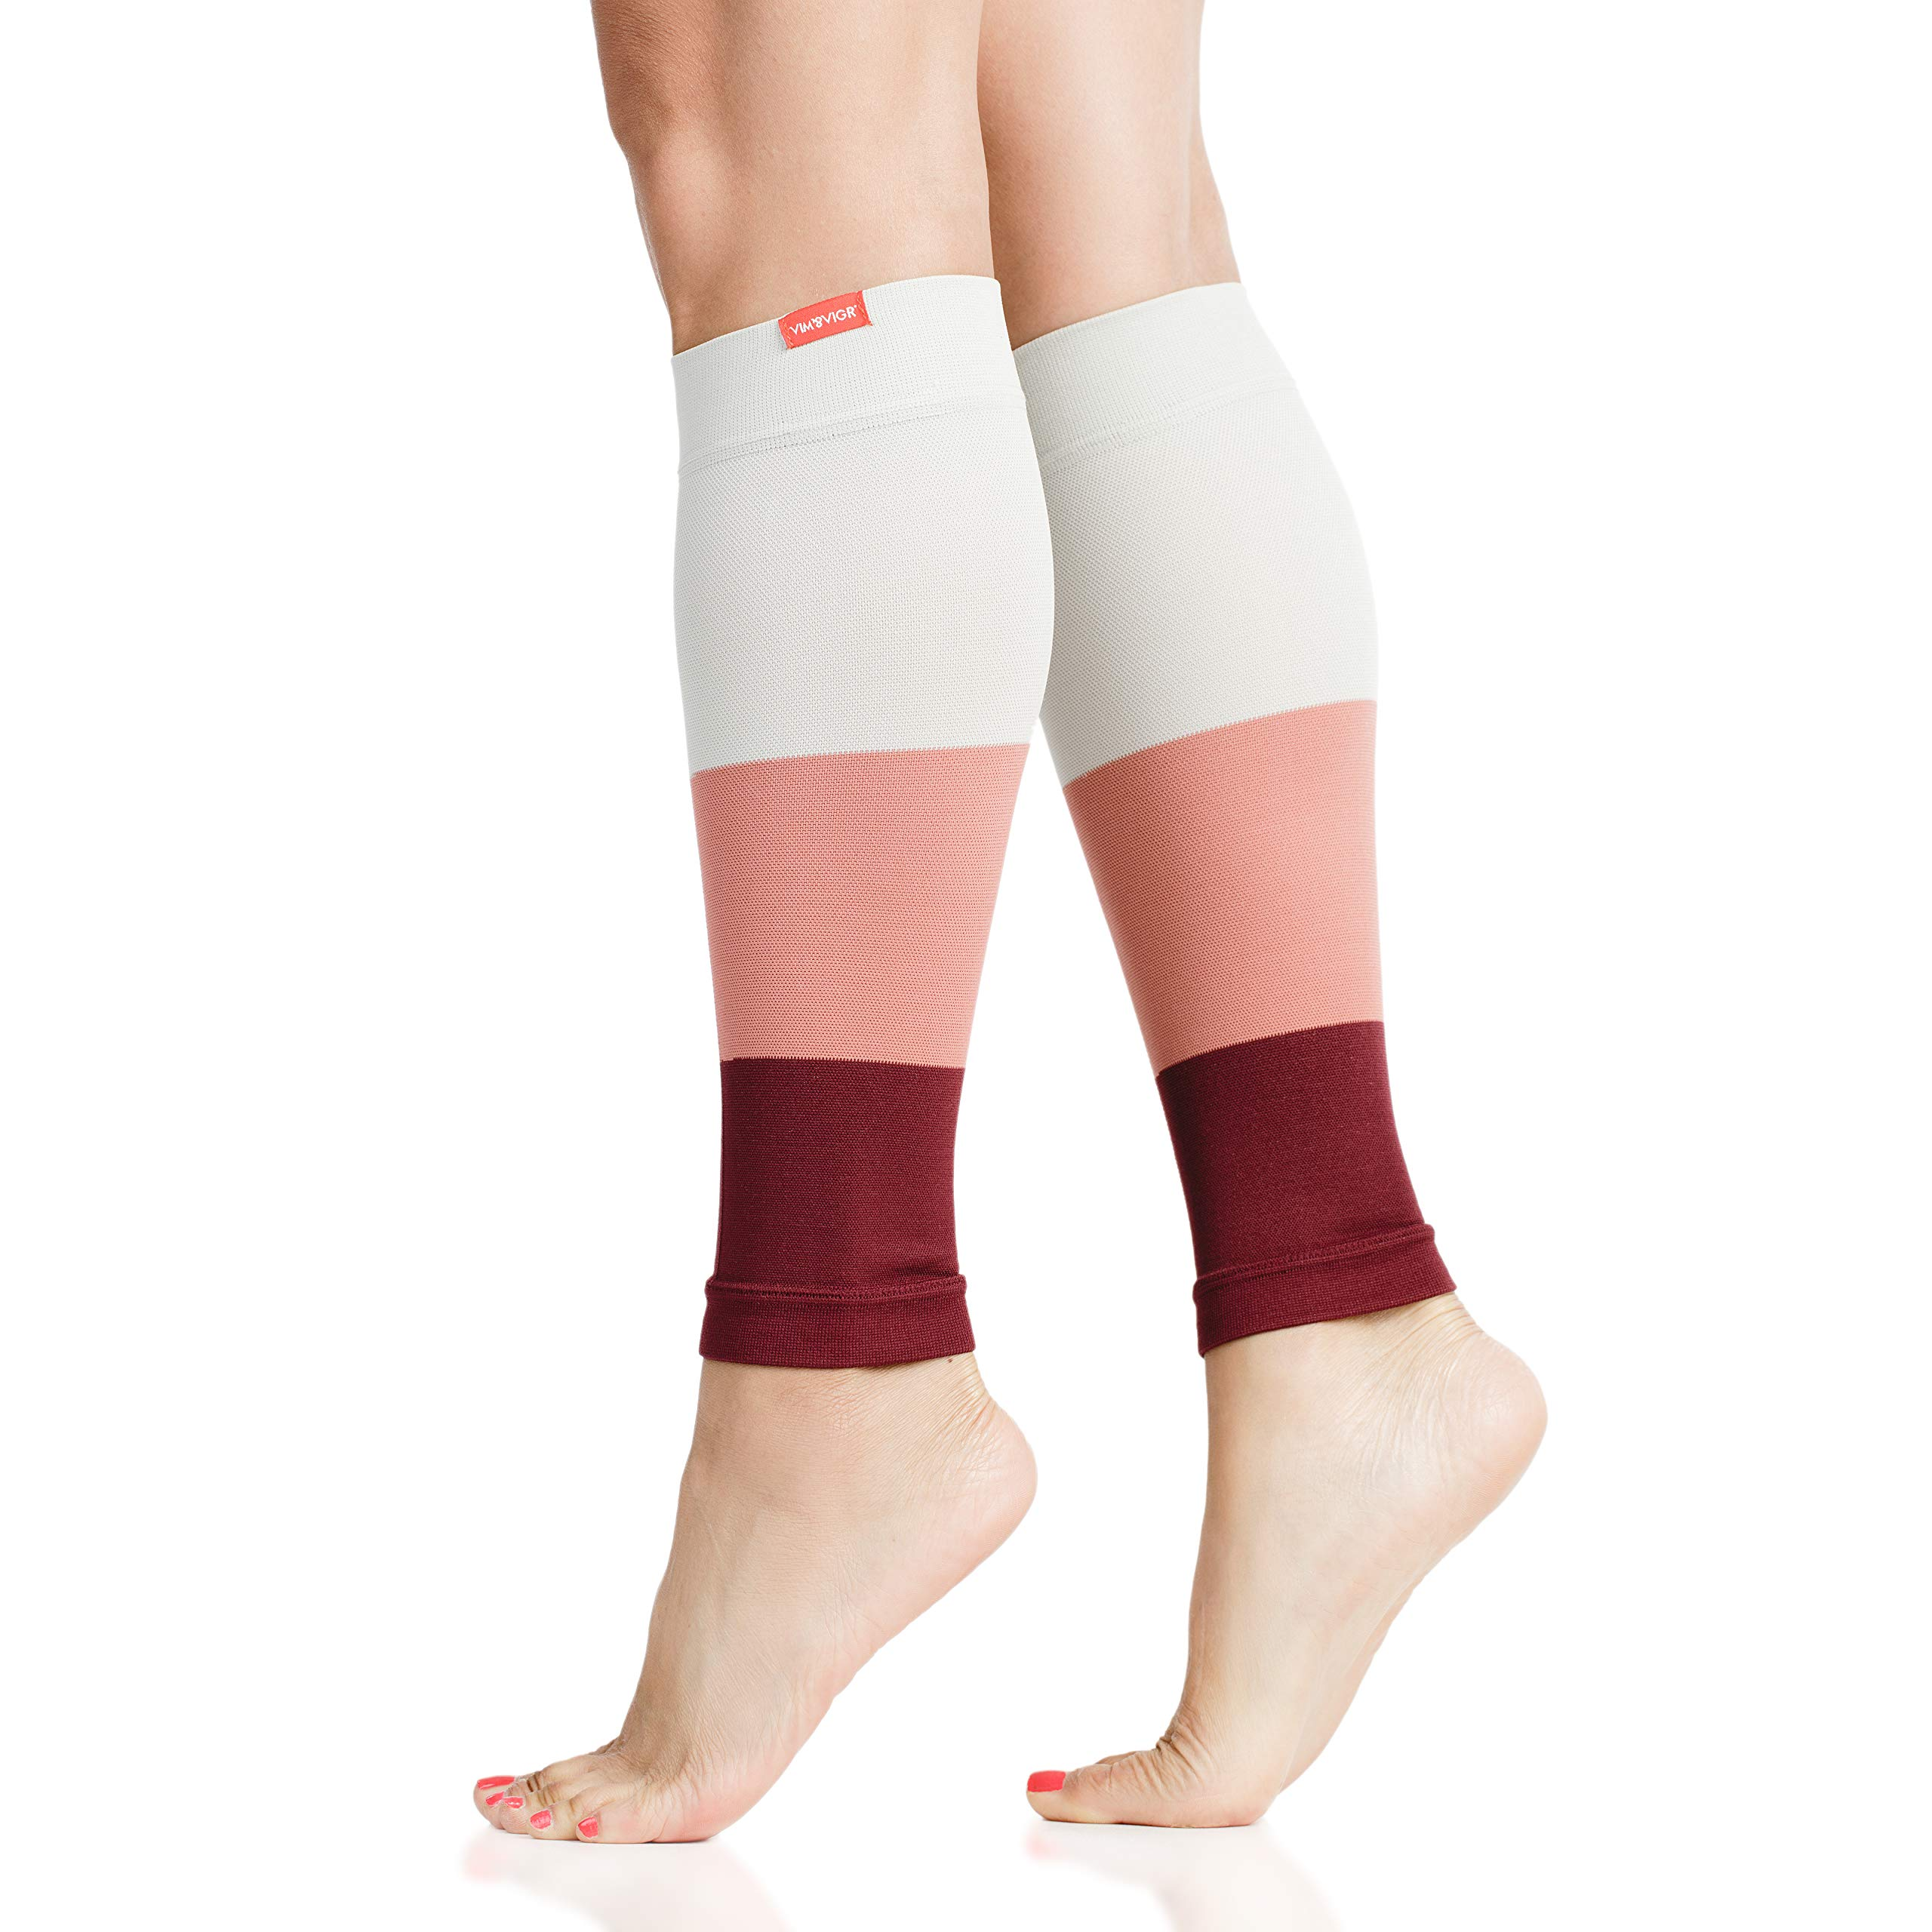 VIM & VIGR 15-20 mmHg Compression Leg Sleeves for Women & Men (Peach & Rhubarb Colorblock Nylon, 1)